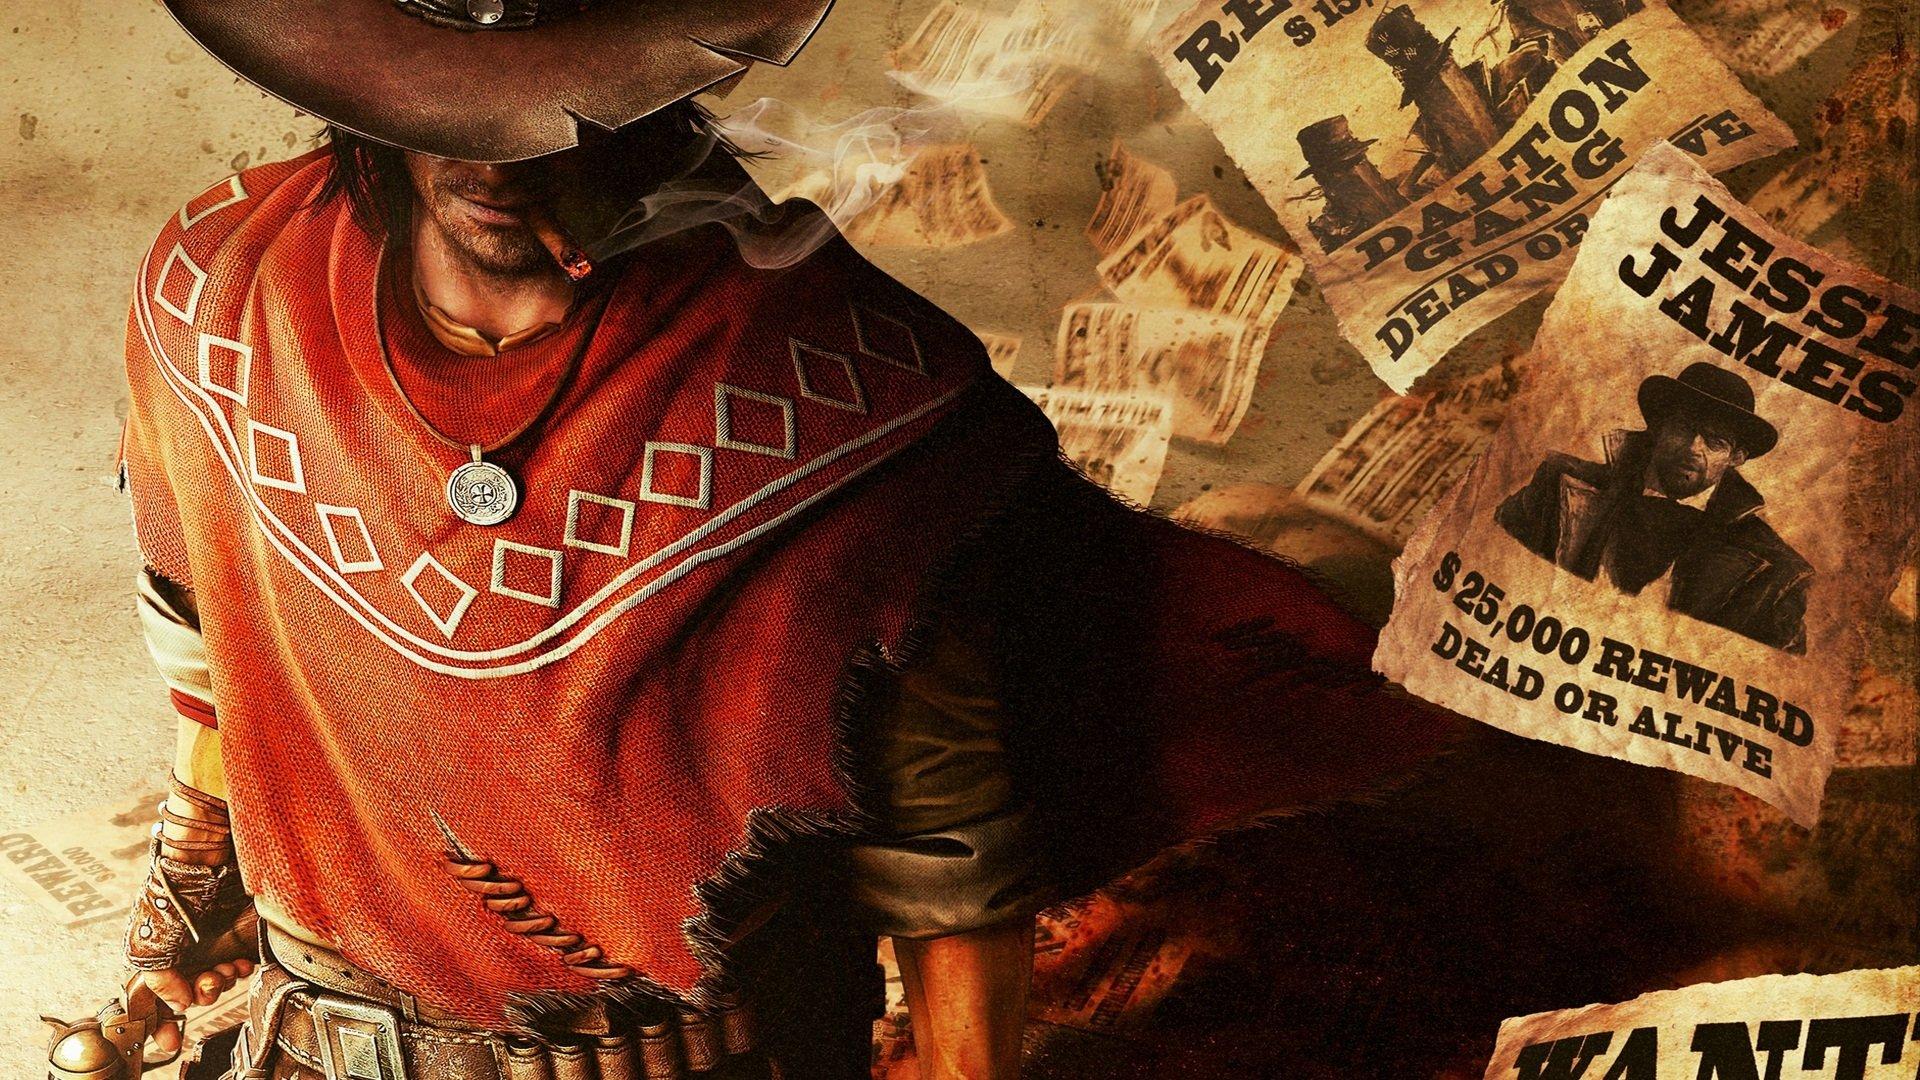 Call of juarez gunslinger full hd wallpaper and background image video game call of juarez gunslinger wallpaper voltagebd Choice Image